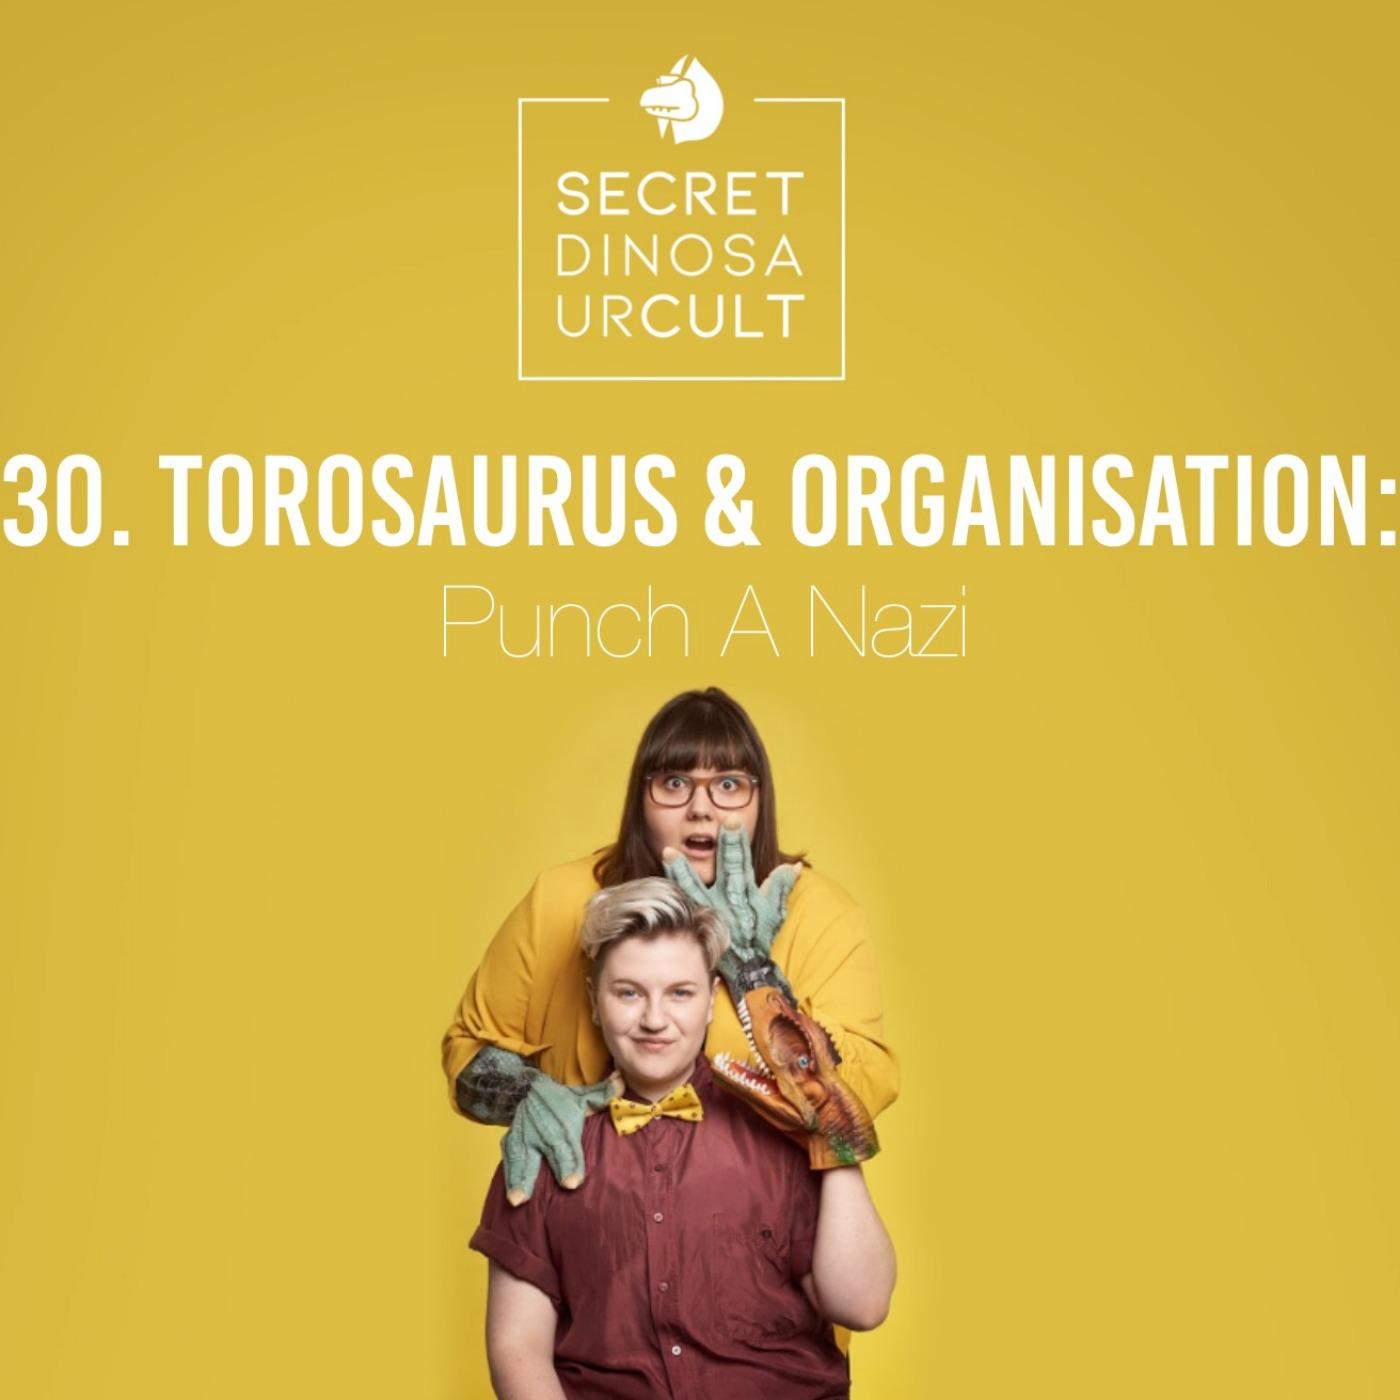 30. Torosaurus & Organisation: Punch A Nazi